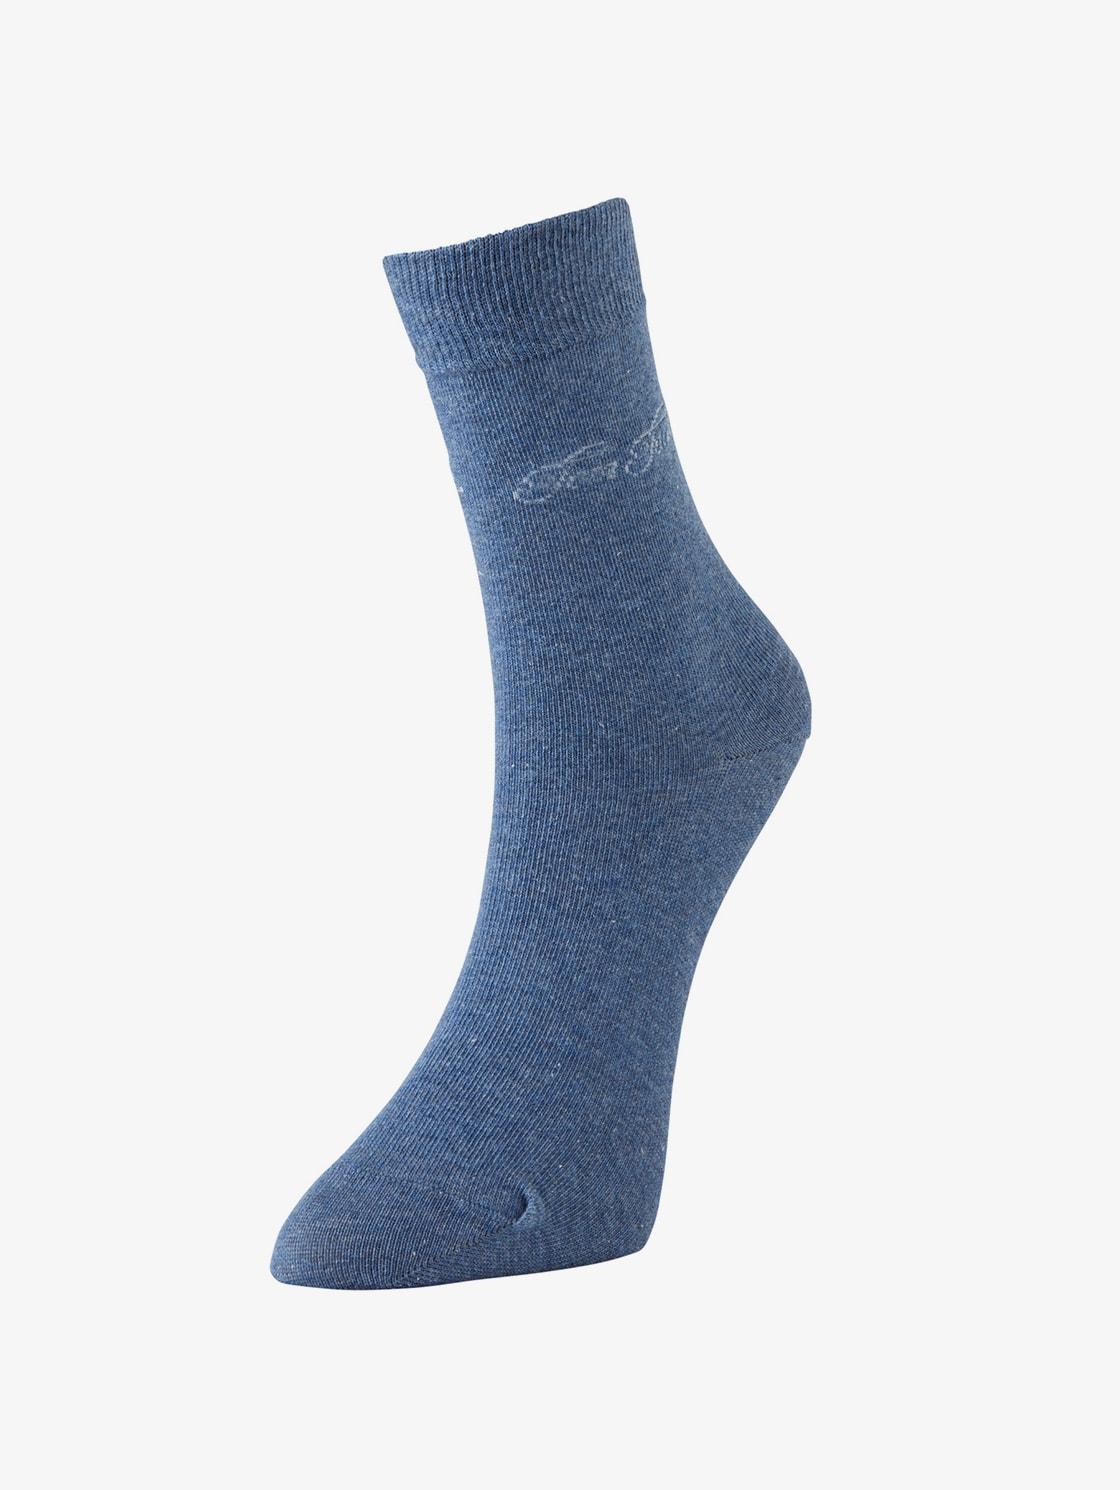 Tom Tailor Casual Socken im Doppelpack, Damen, light denim melange, Größe: 35 38